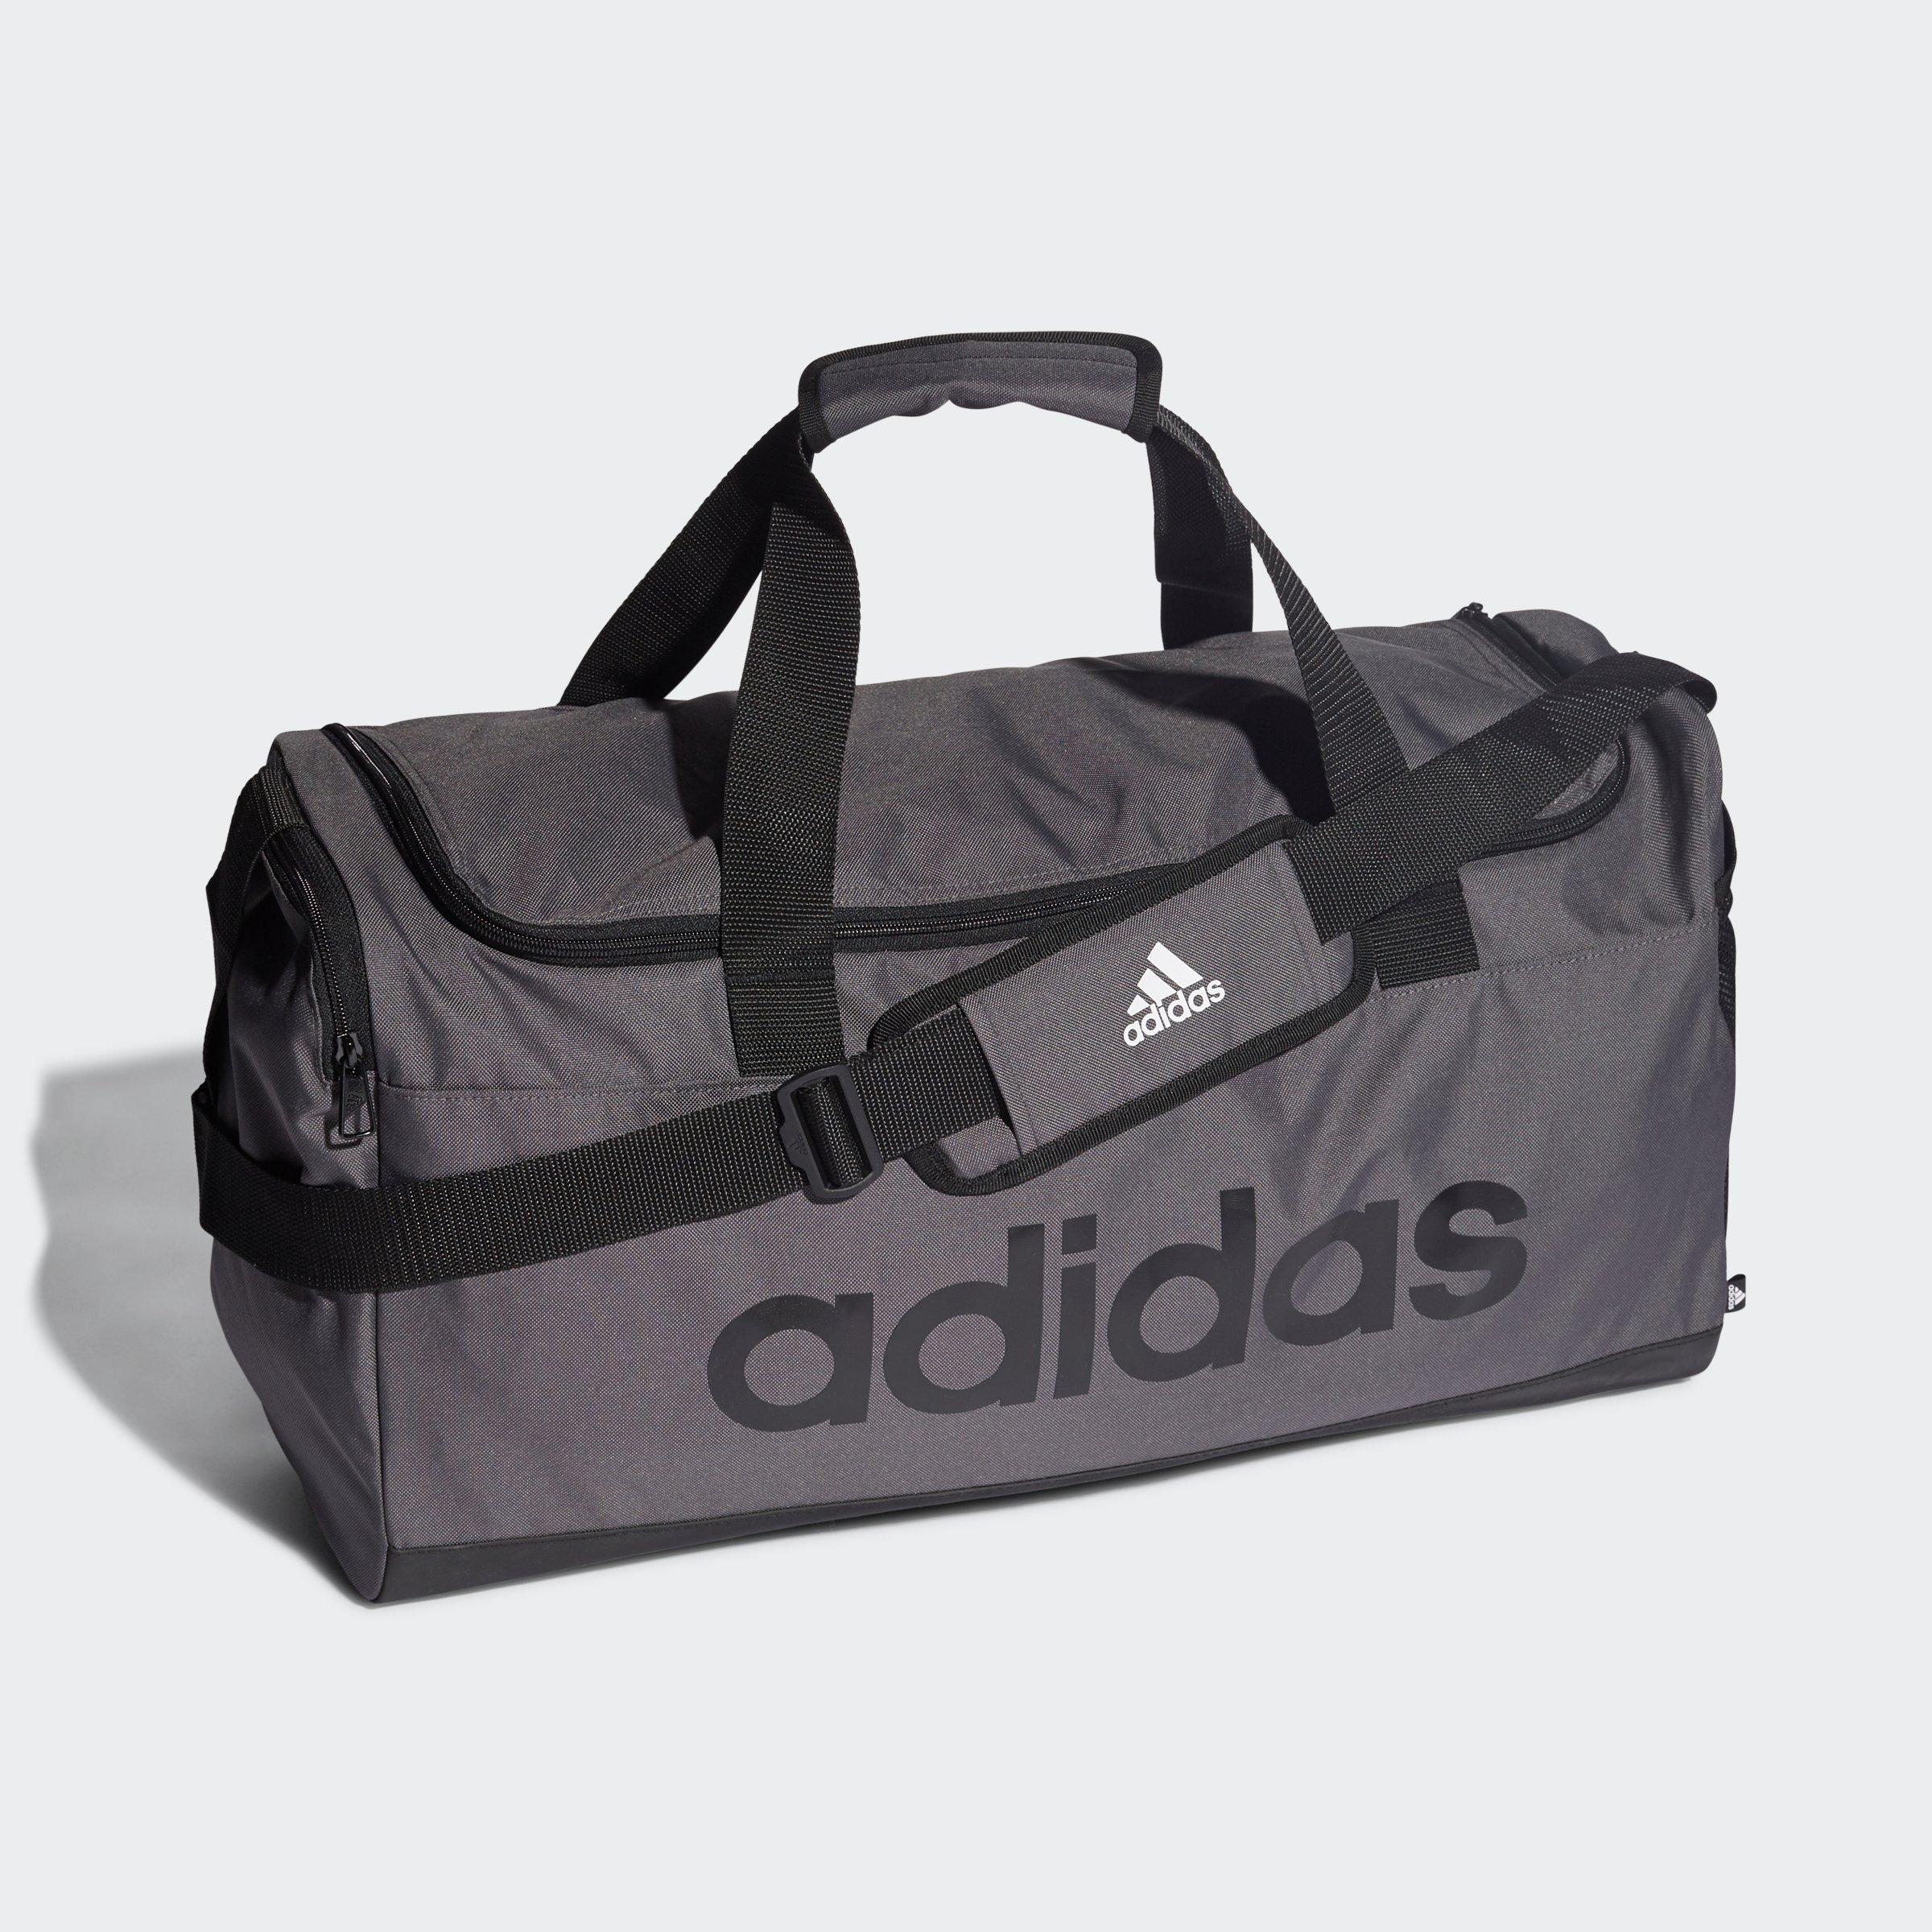 adidas Performance sporttas ESSENTIALS LOGO DUFFELBAG MEDIUM voordelig en veilig online kopen